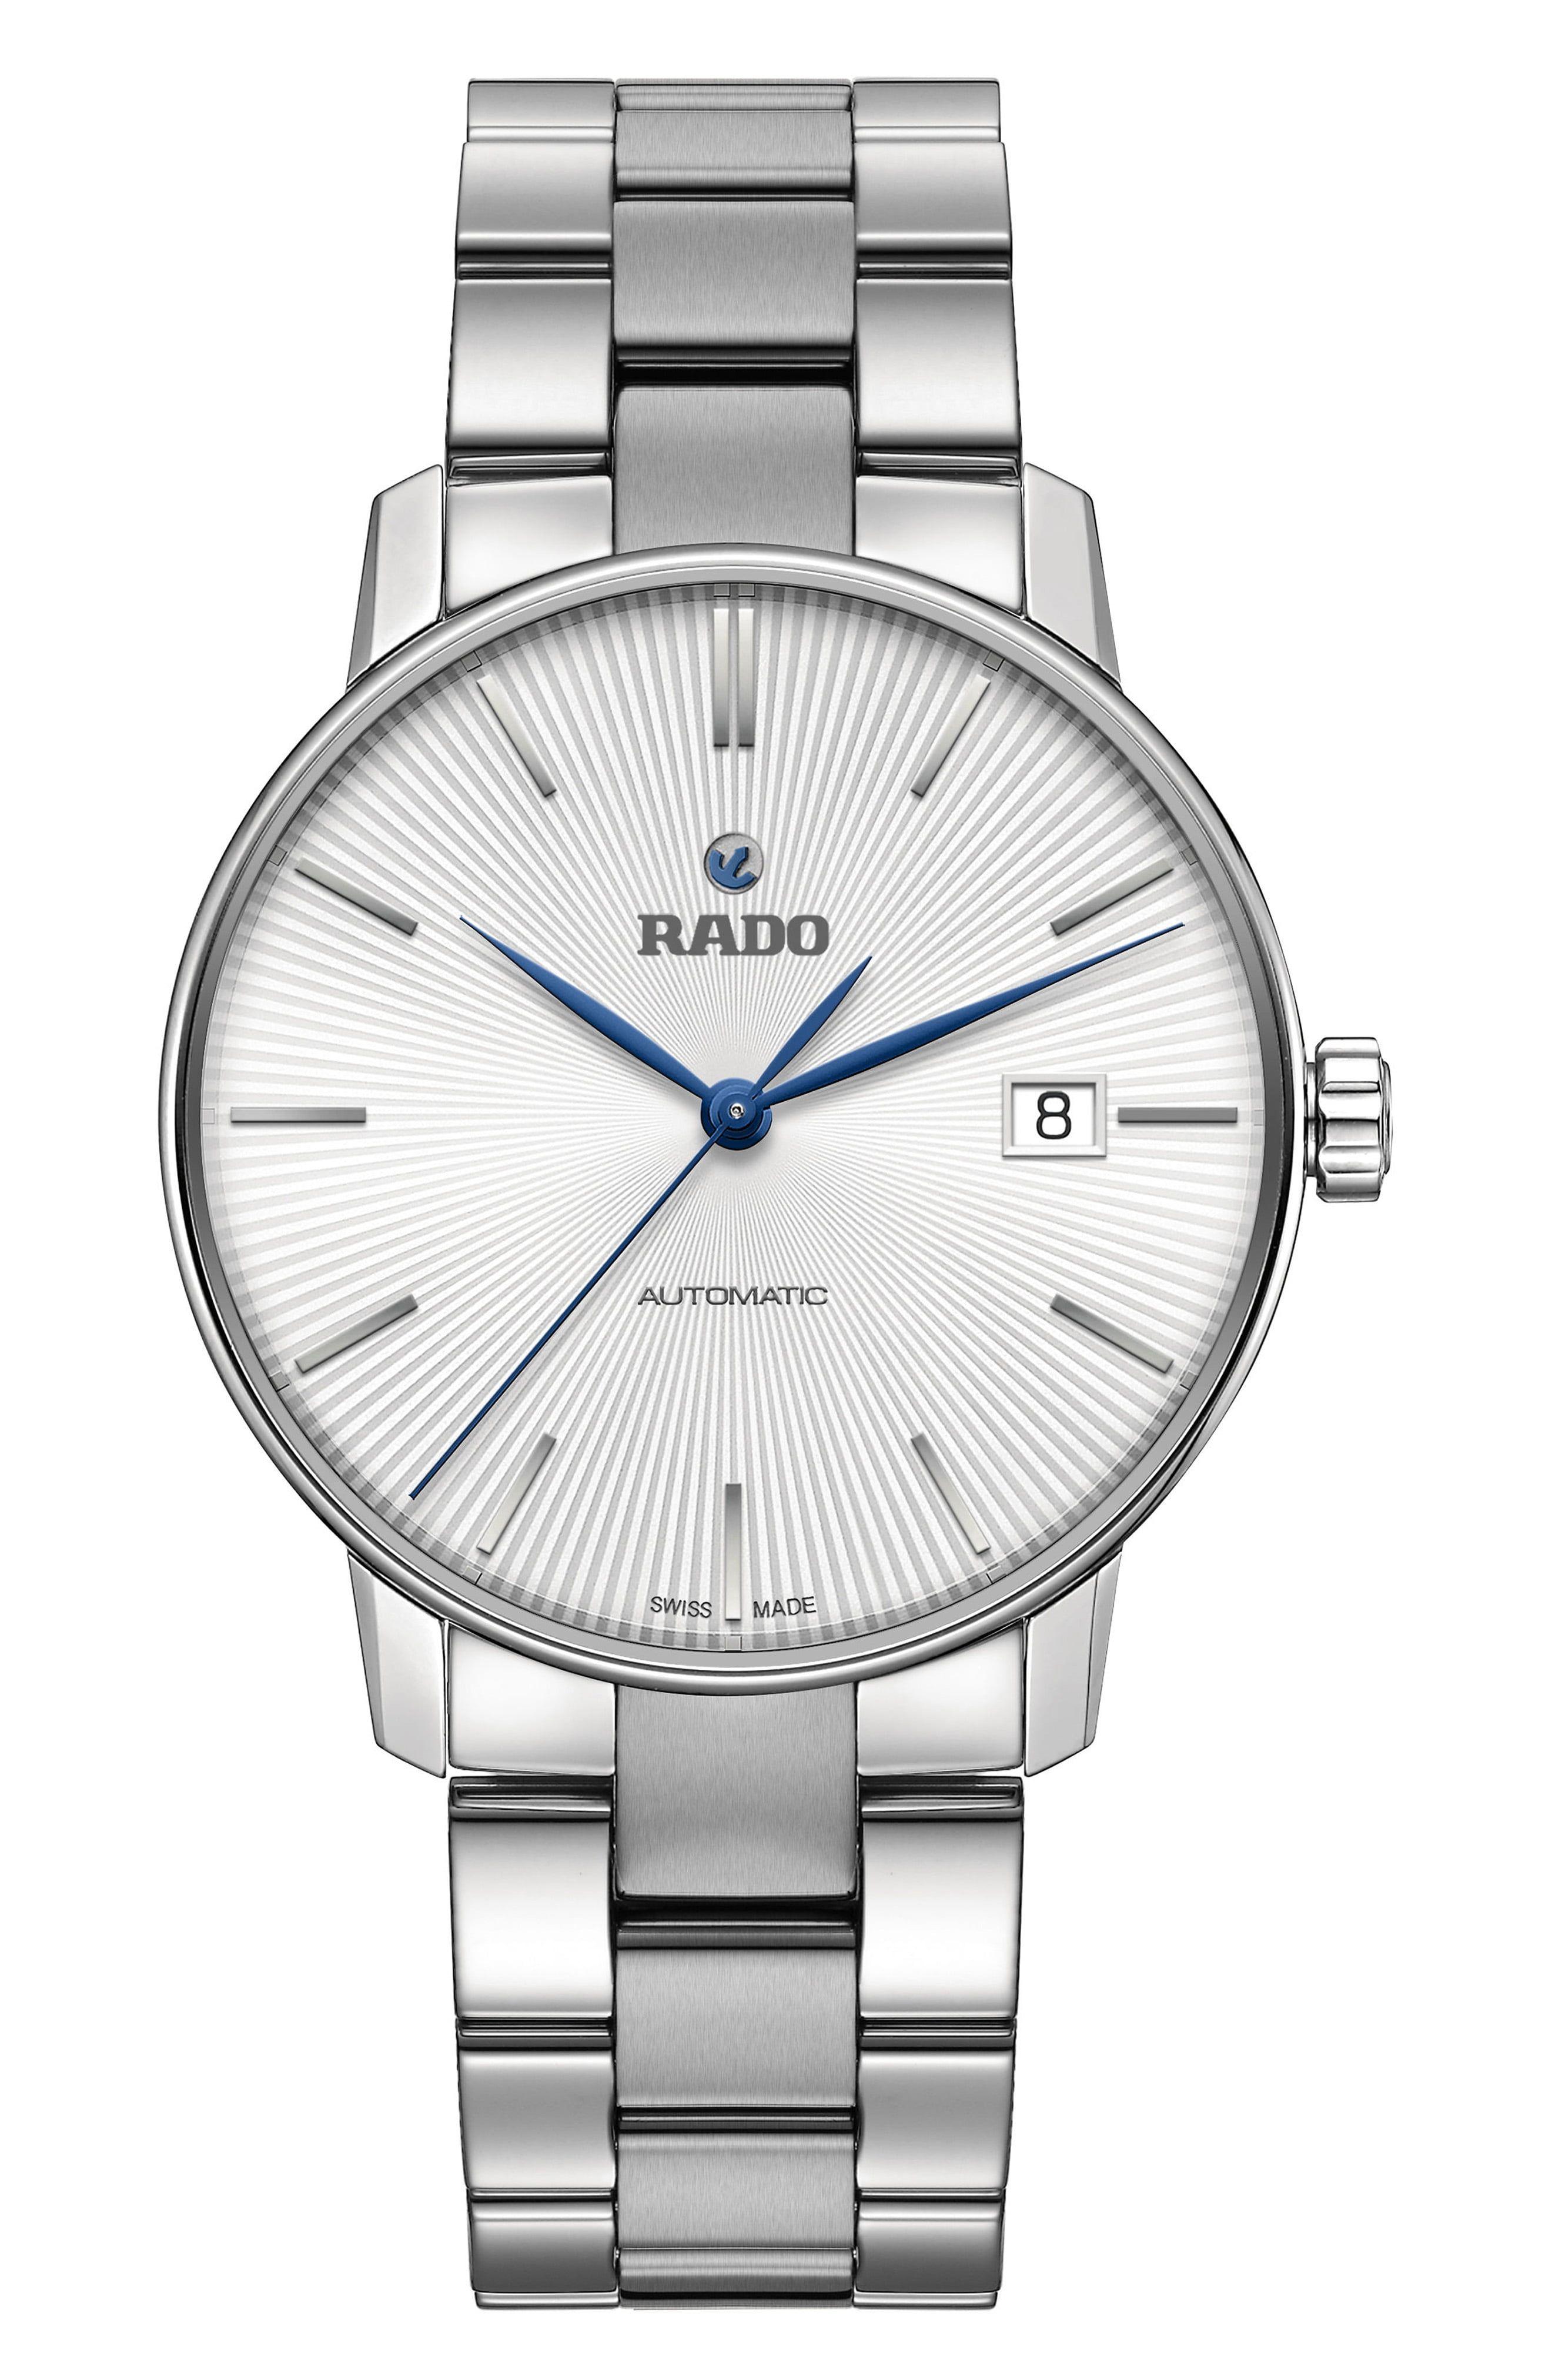 Rado Coupole Classic Automatic Bracelet Watch 37 7mm Nordstrom Bracelet Watch Stainless Steel Bracelet Womens Fashion Jewelry